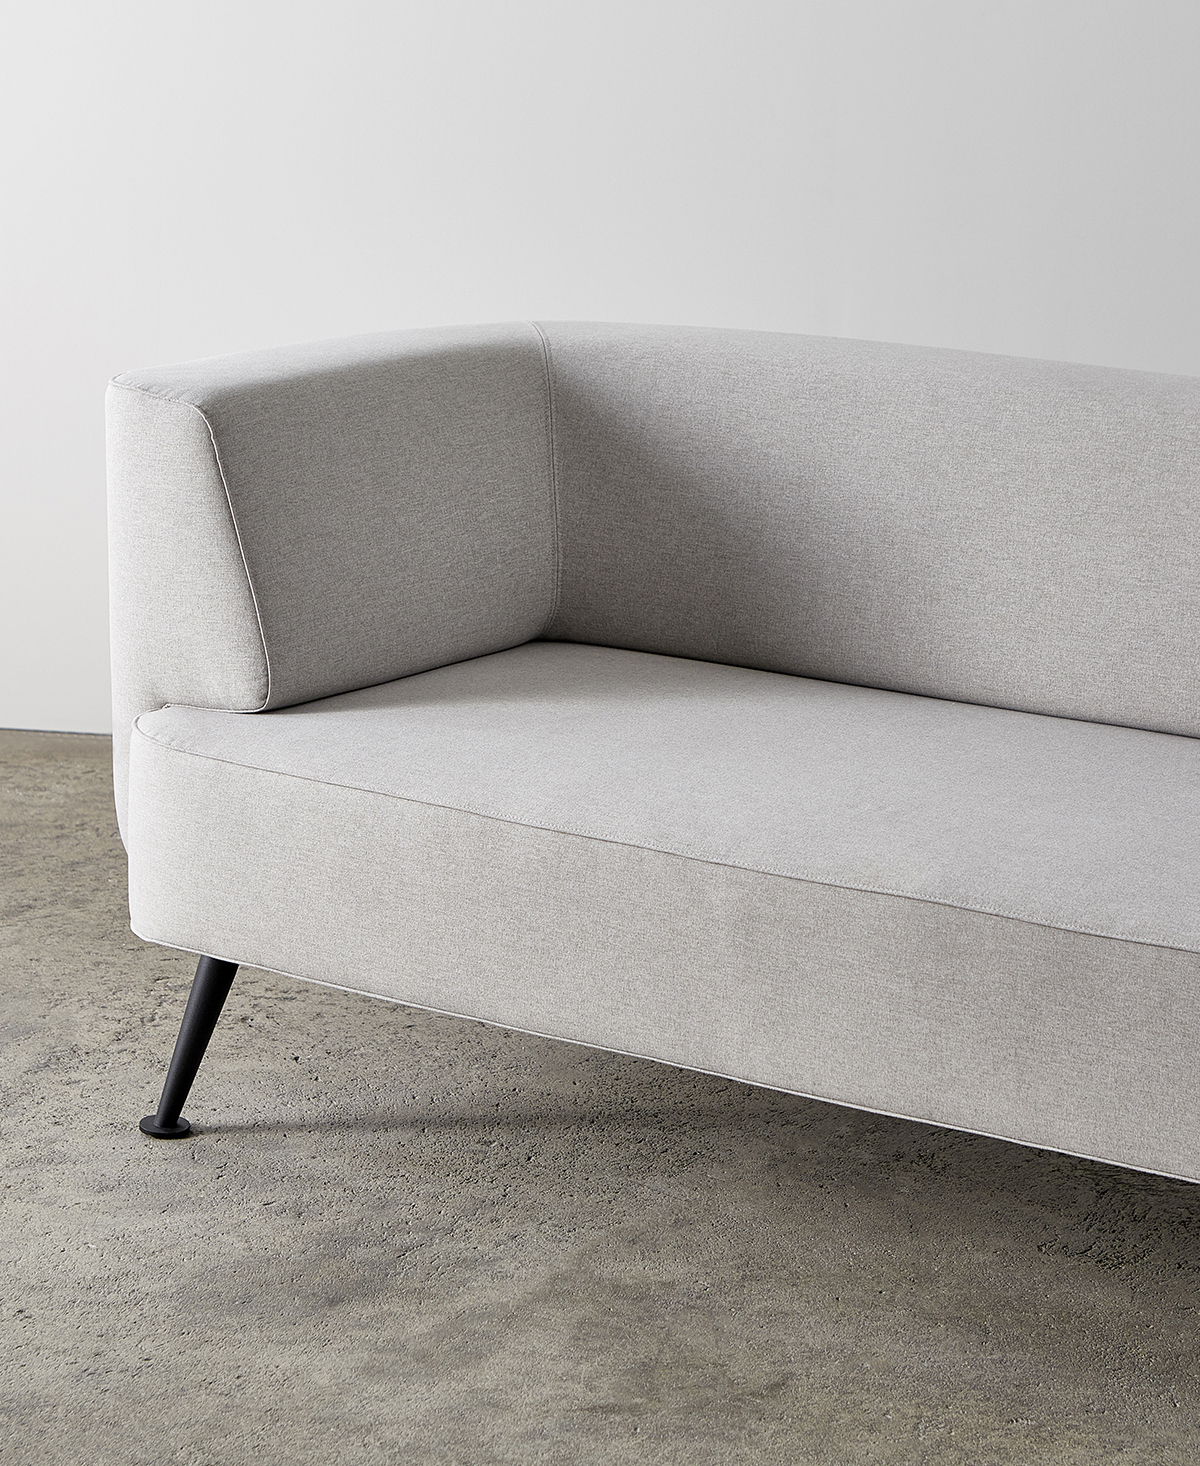 Versatile Stone-Coloured Upholstery